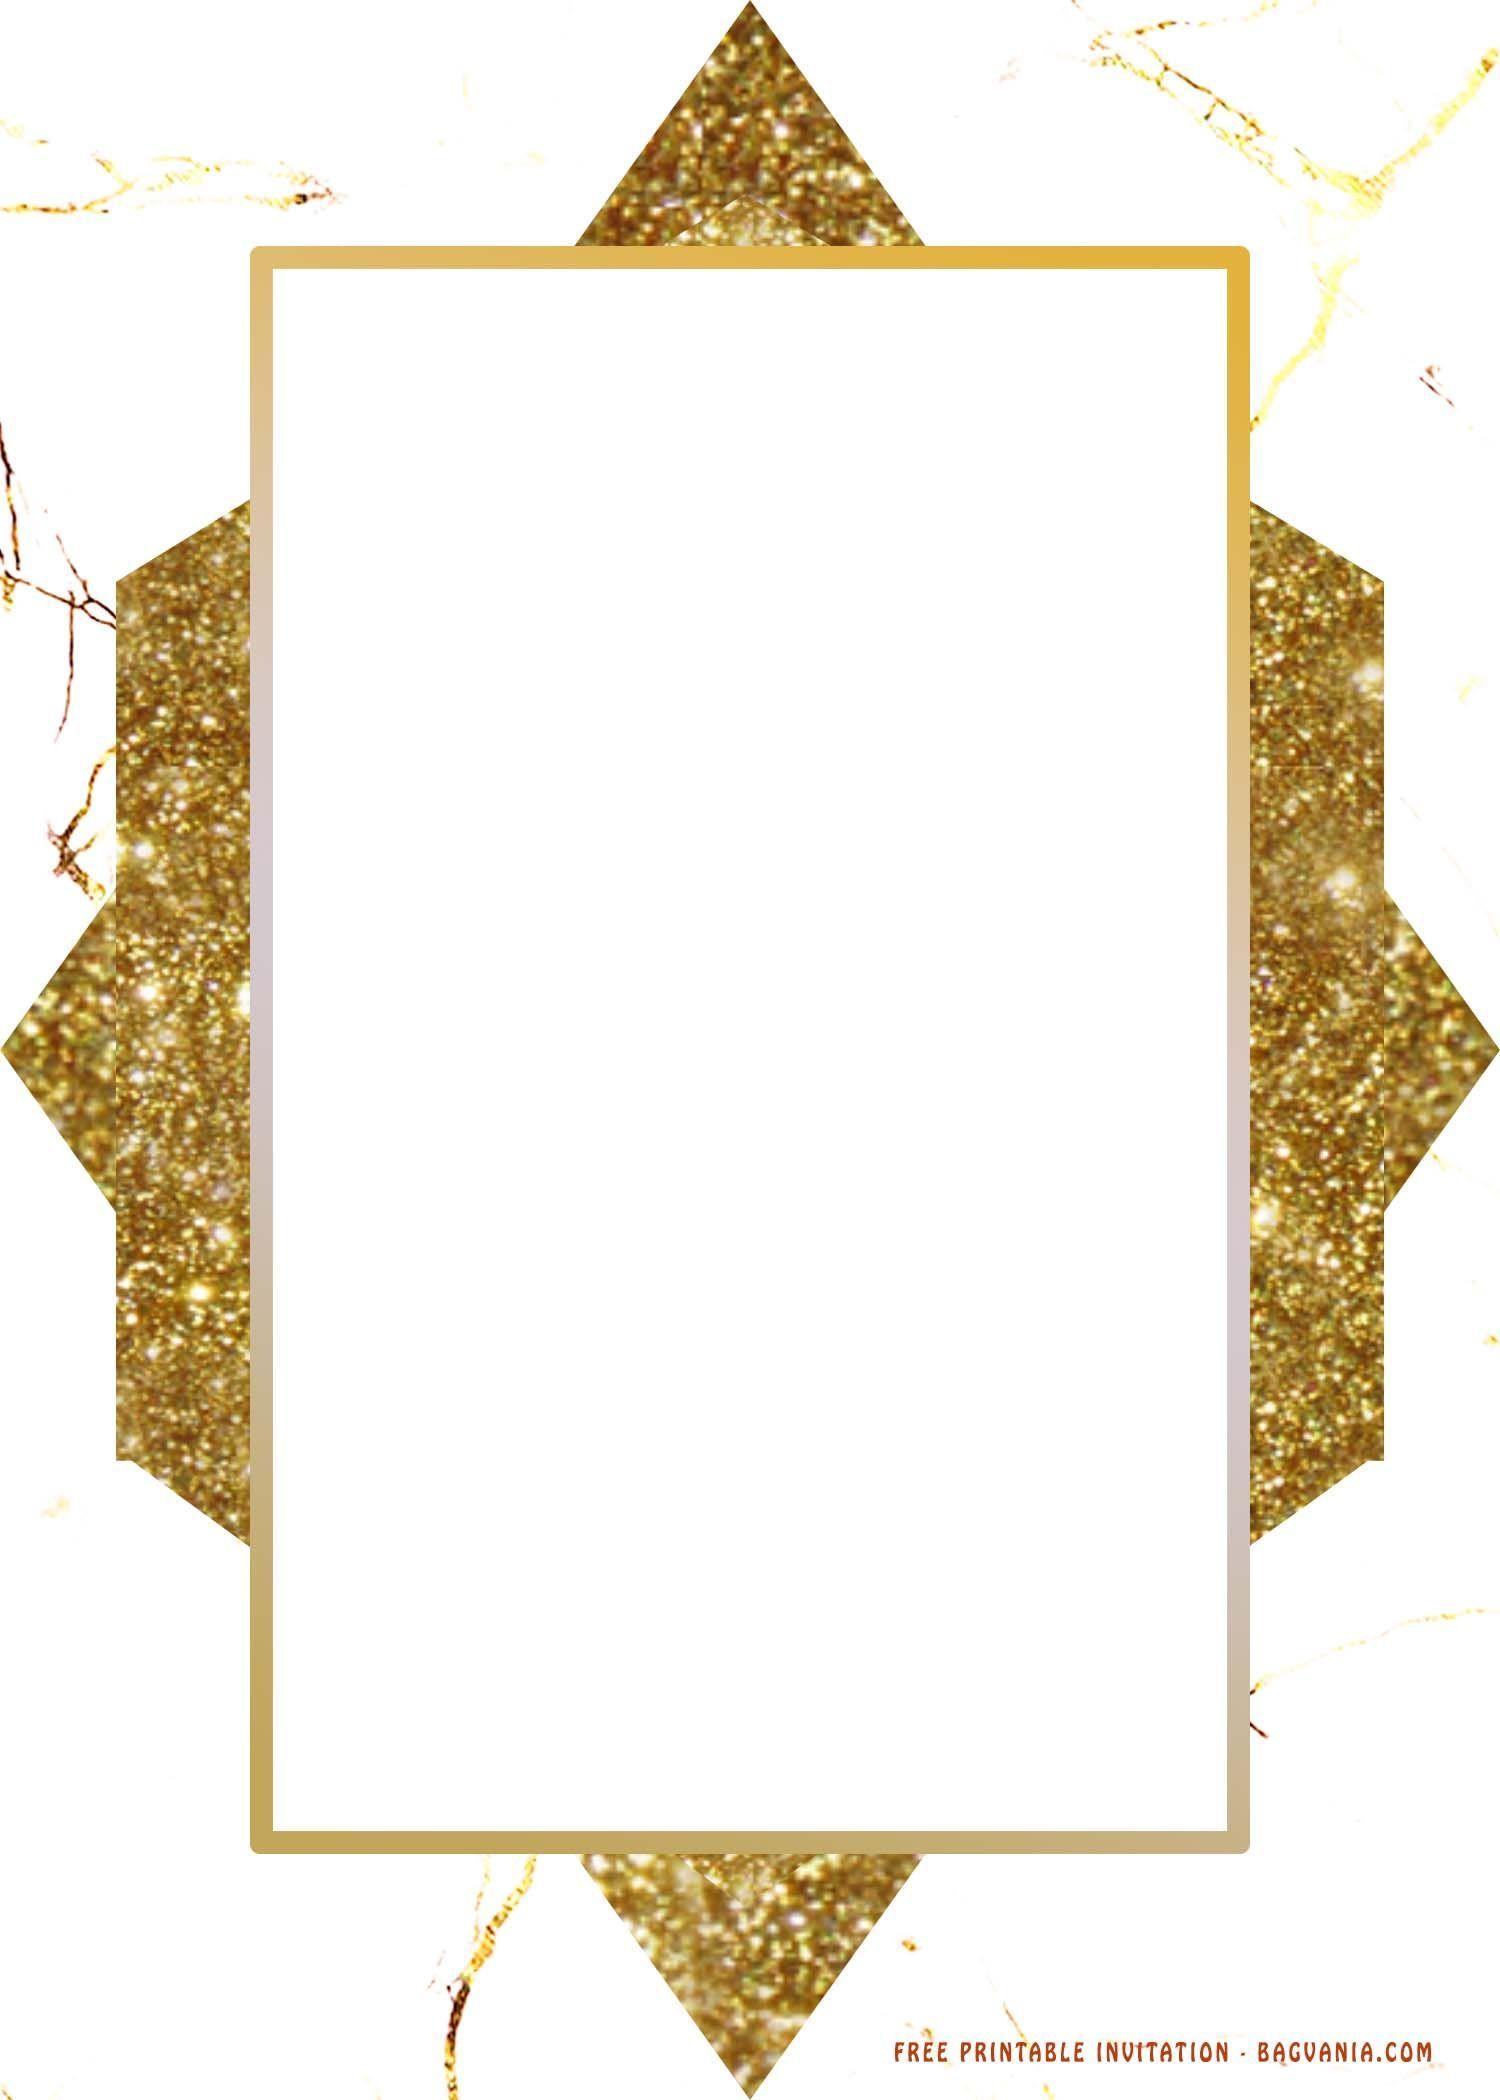 (FREE printable) - Golden marble texture invitation ...